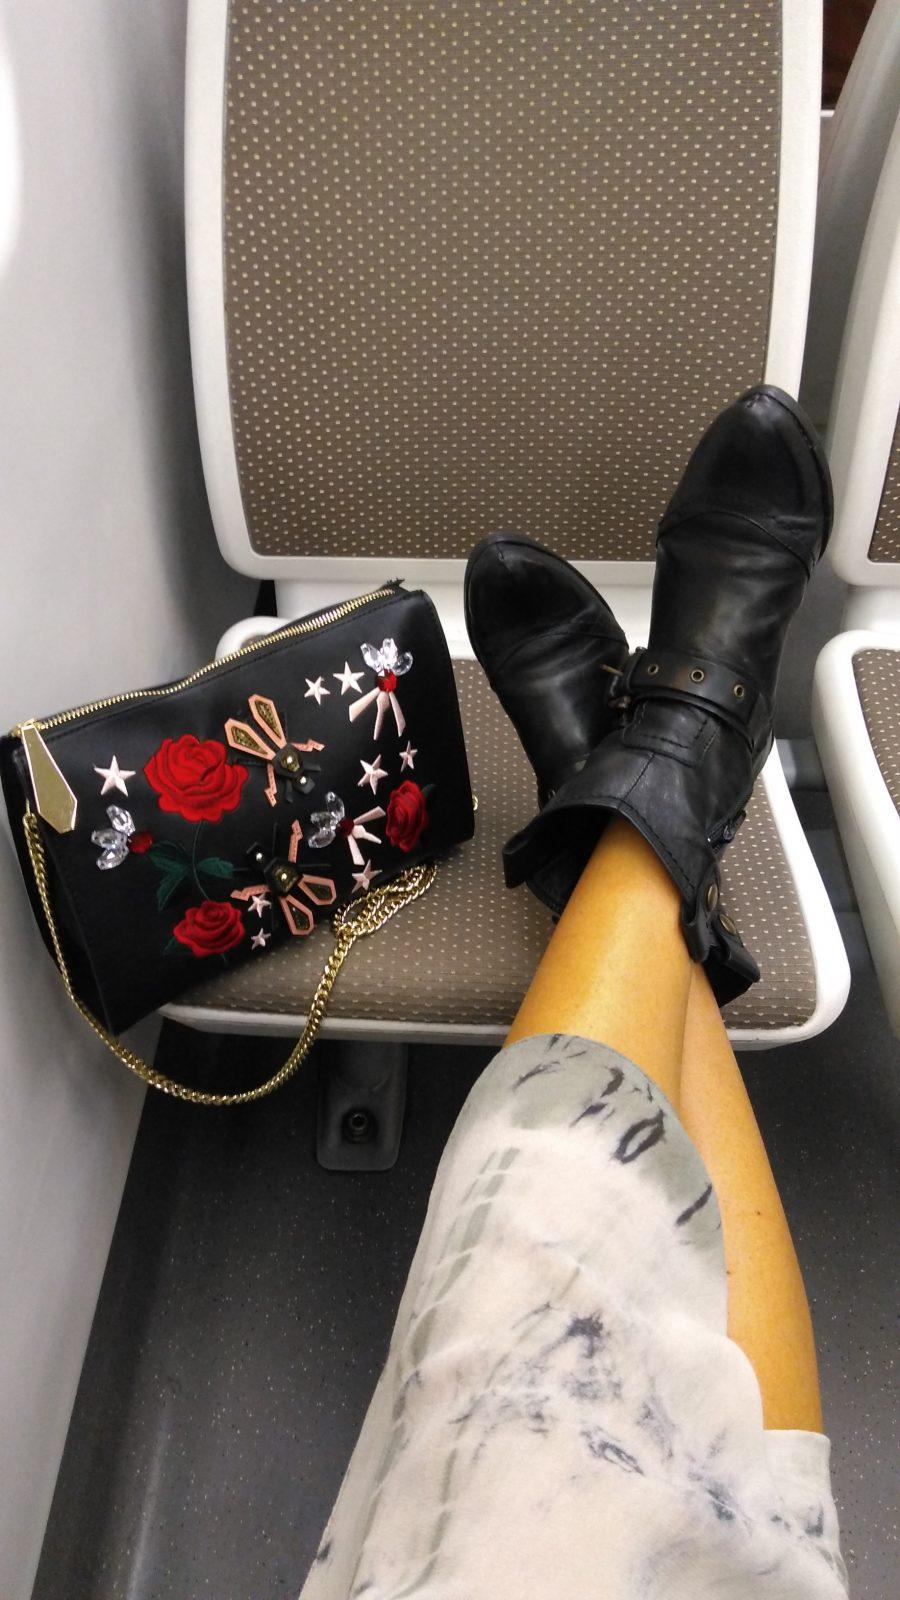 Old, viejo, botas viejas, old Boots, Miss Clov, Rebeca Valdivia, Donostia, personal shopper, botines, hebilla, cowboy, Frida, bag, bandolera, parches,